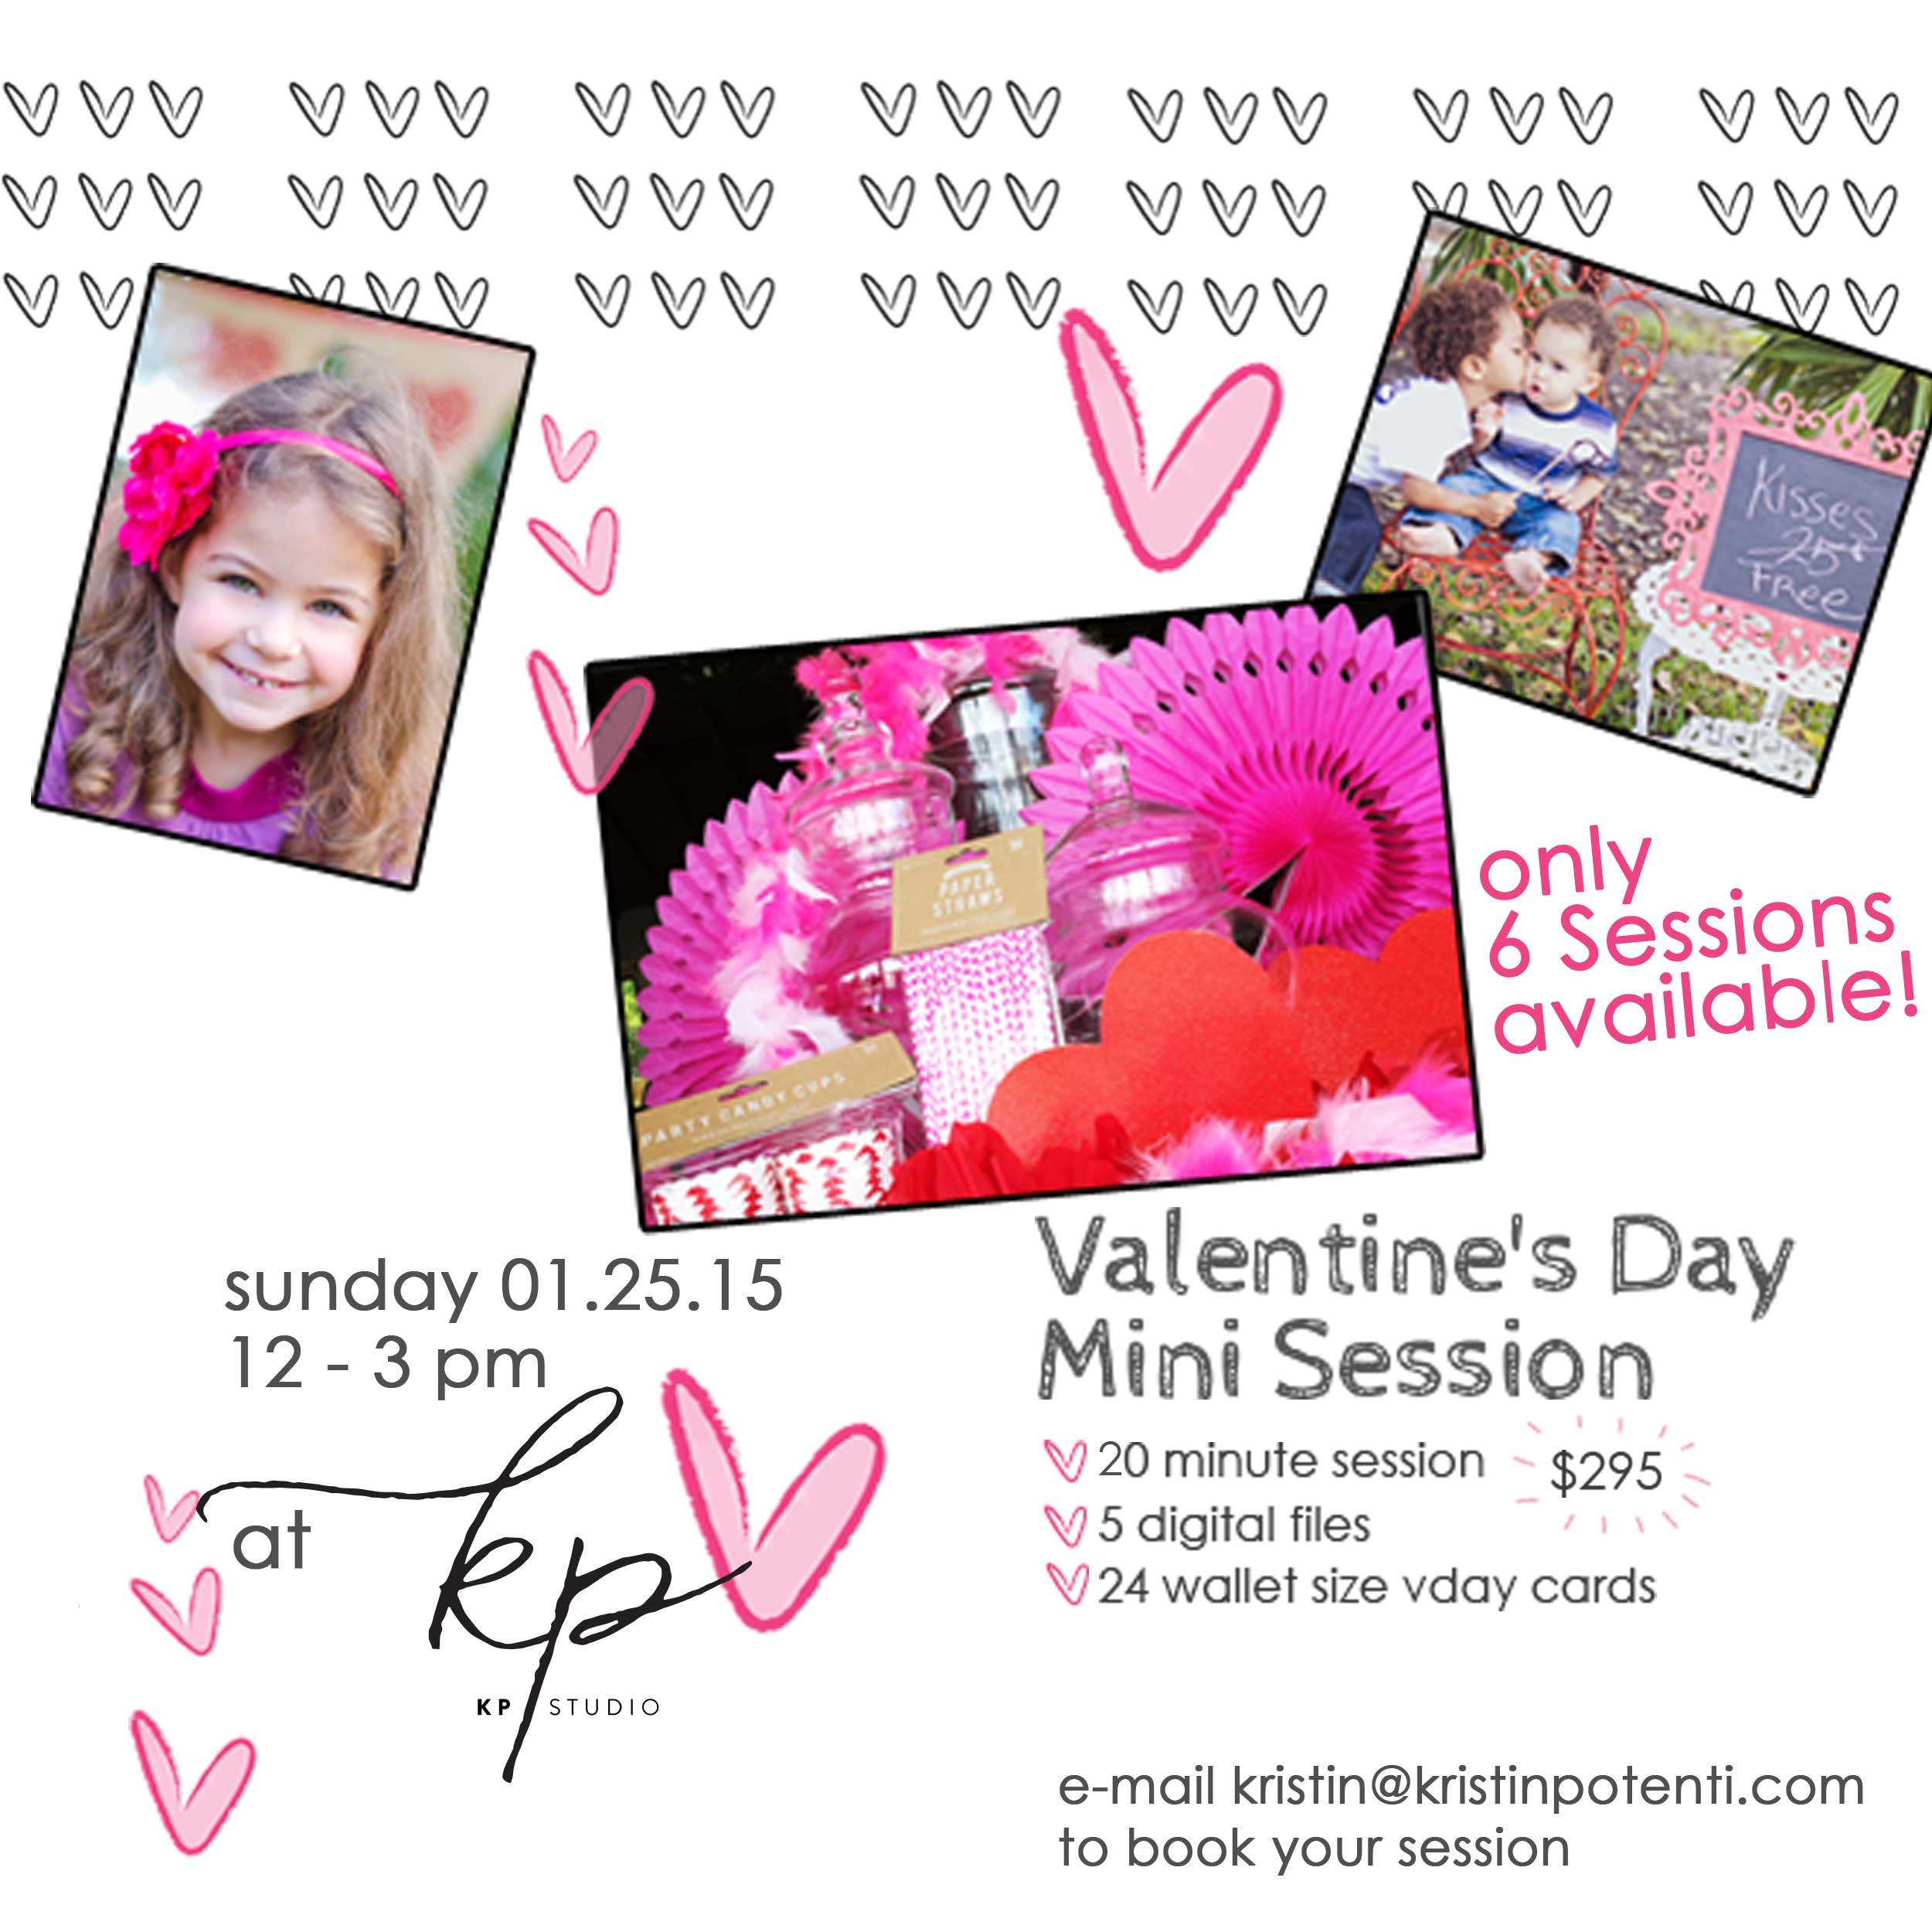 Valentine's Day Mini Sessions